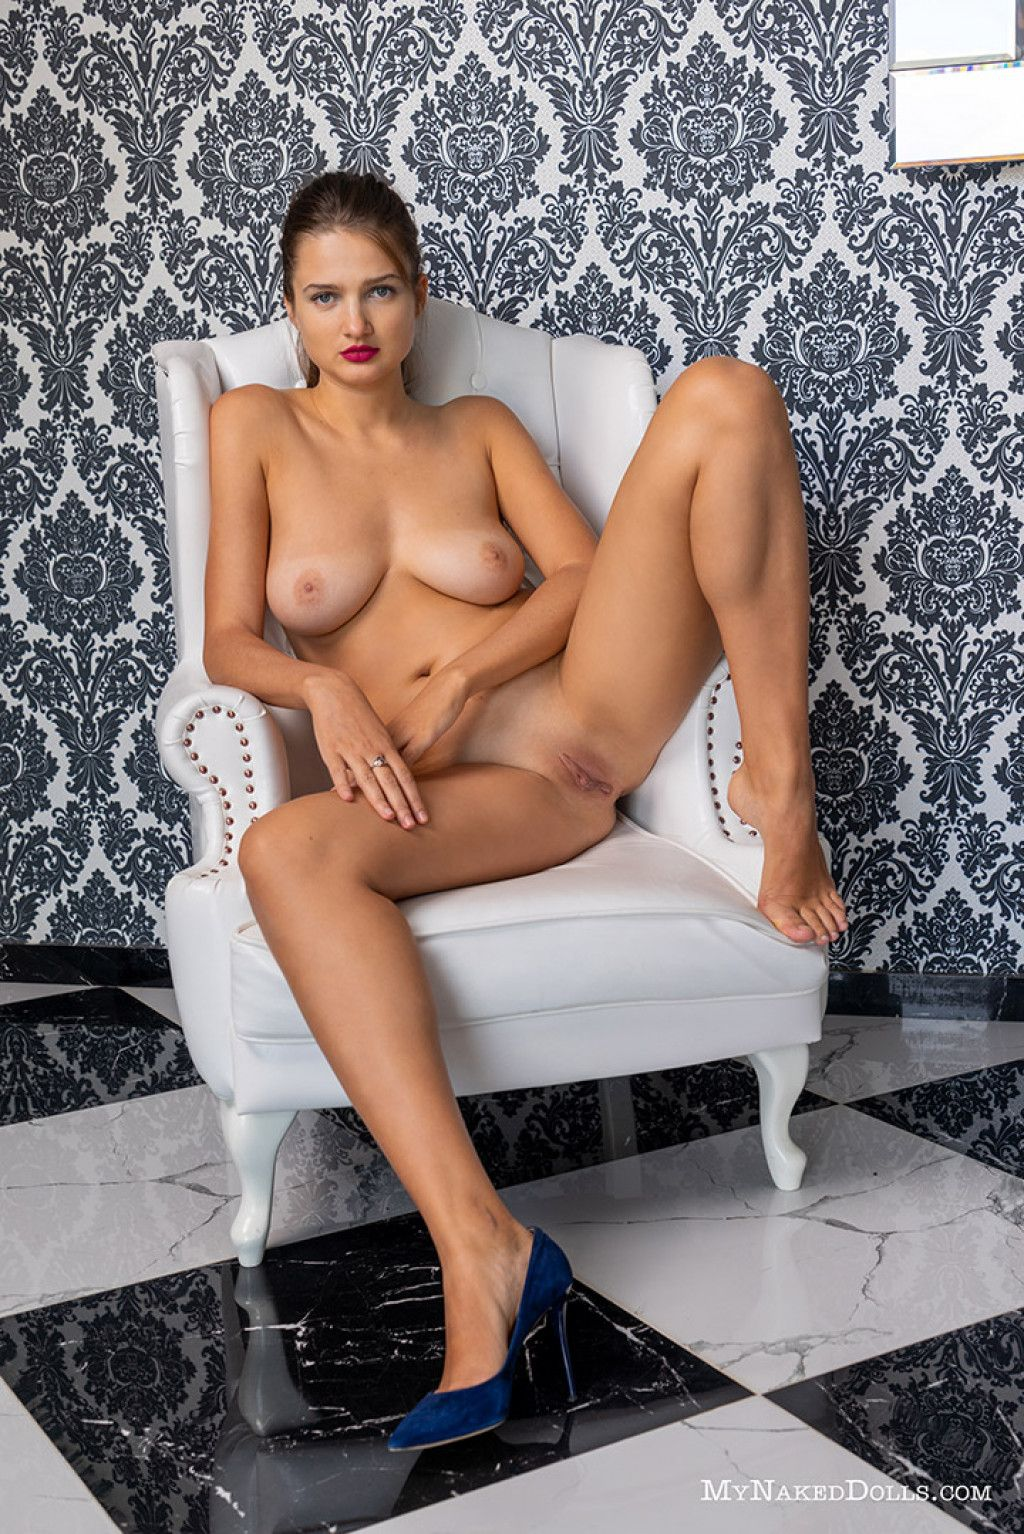 Big sexy girls naked